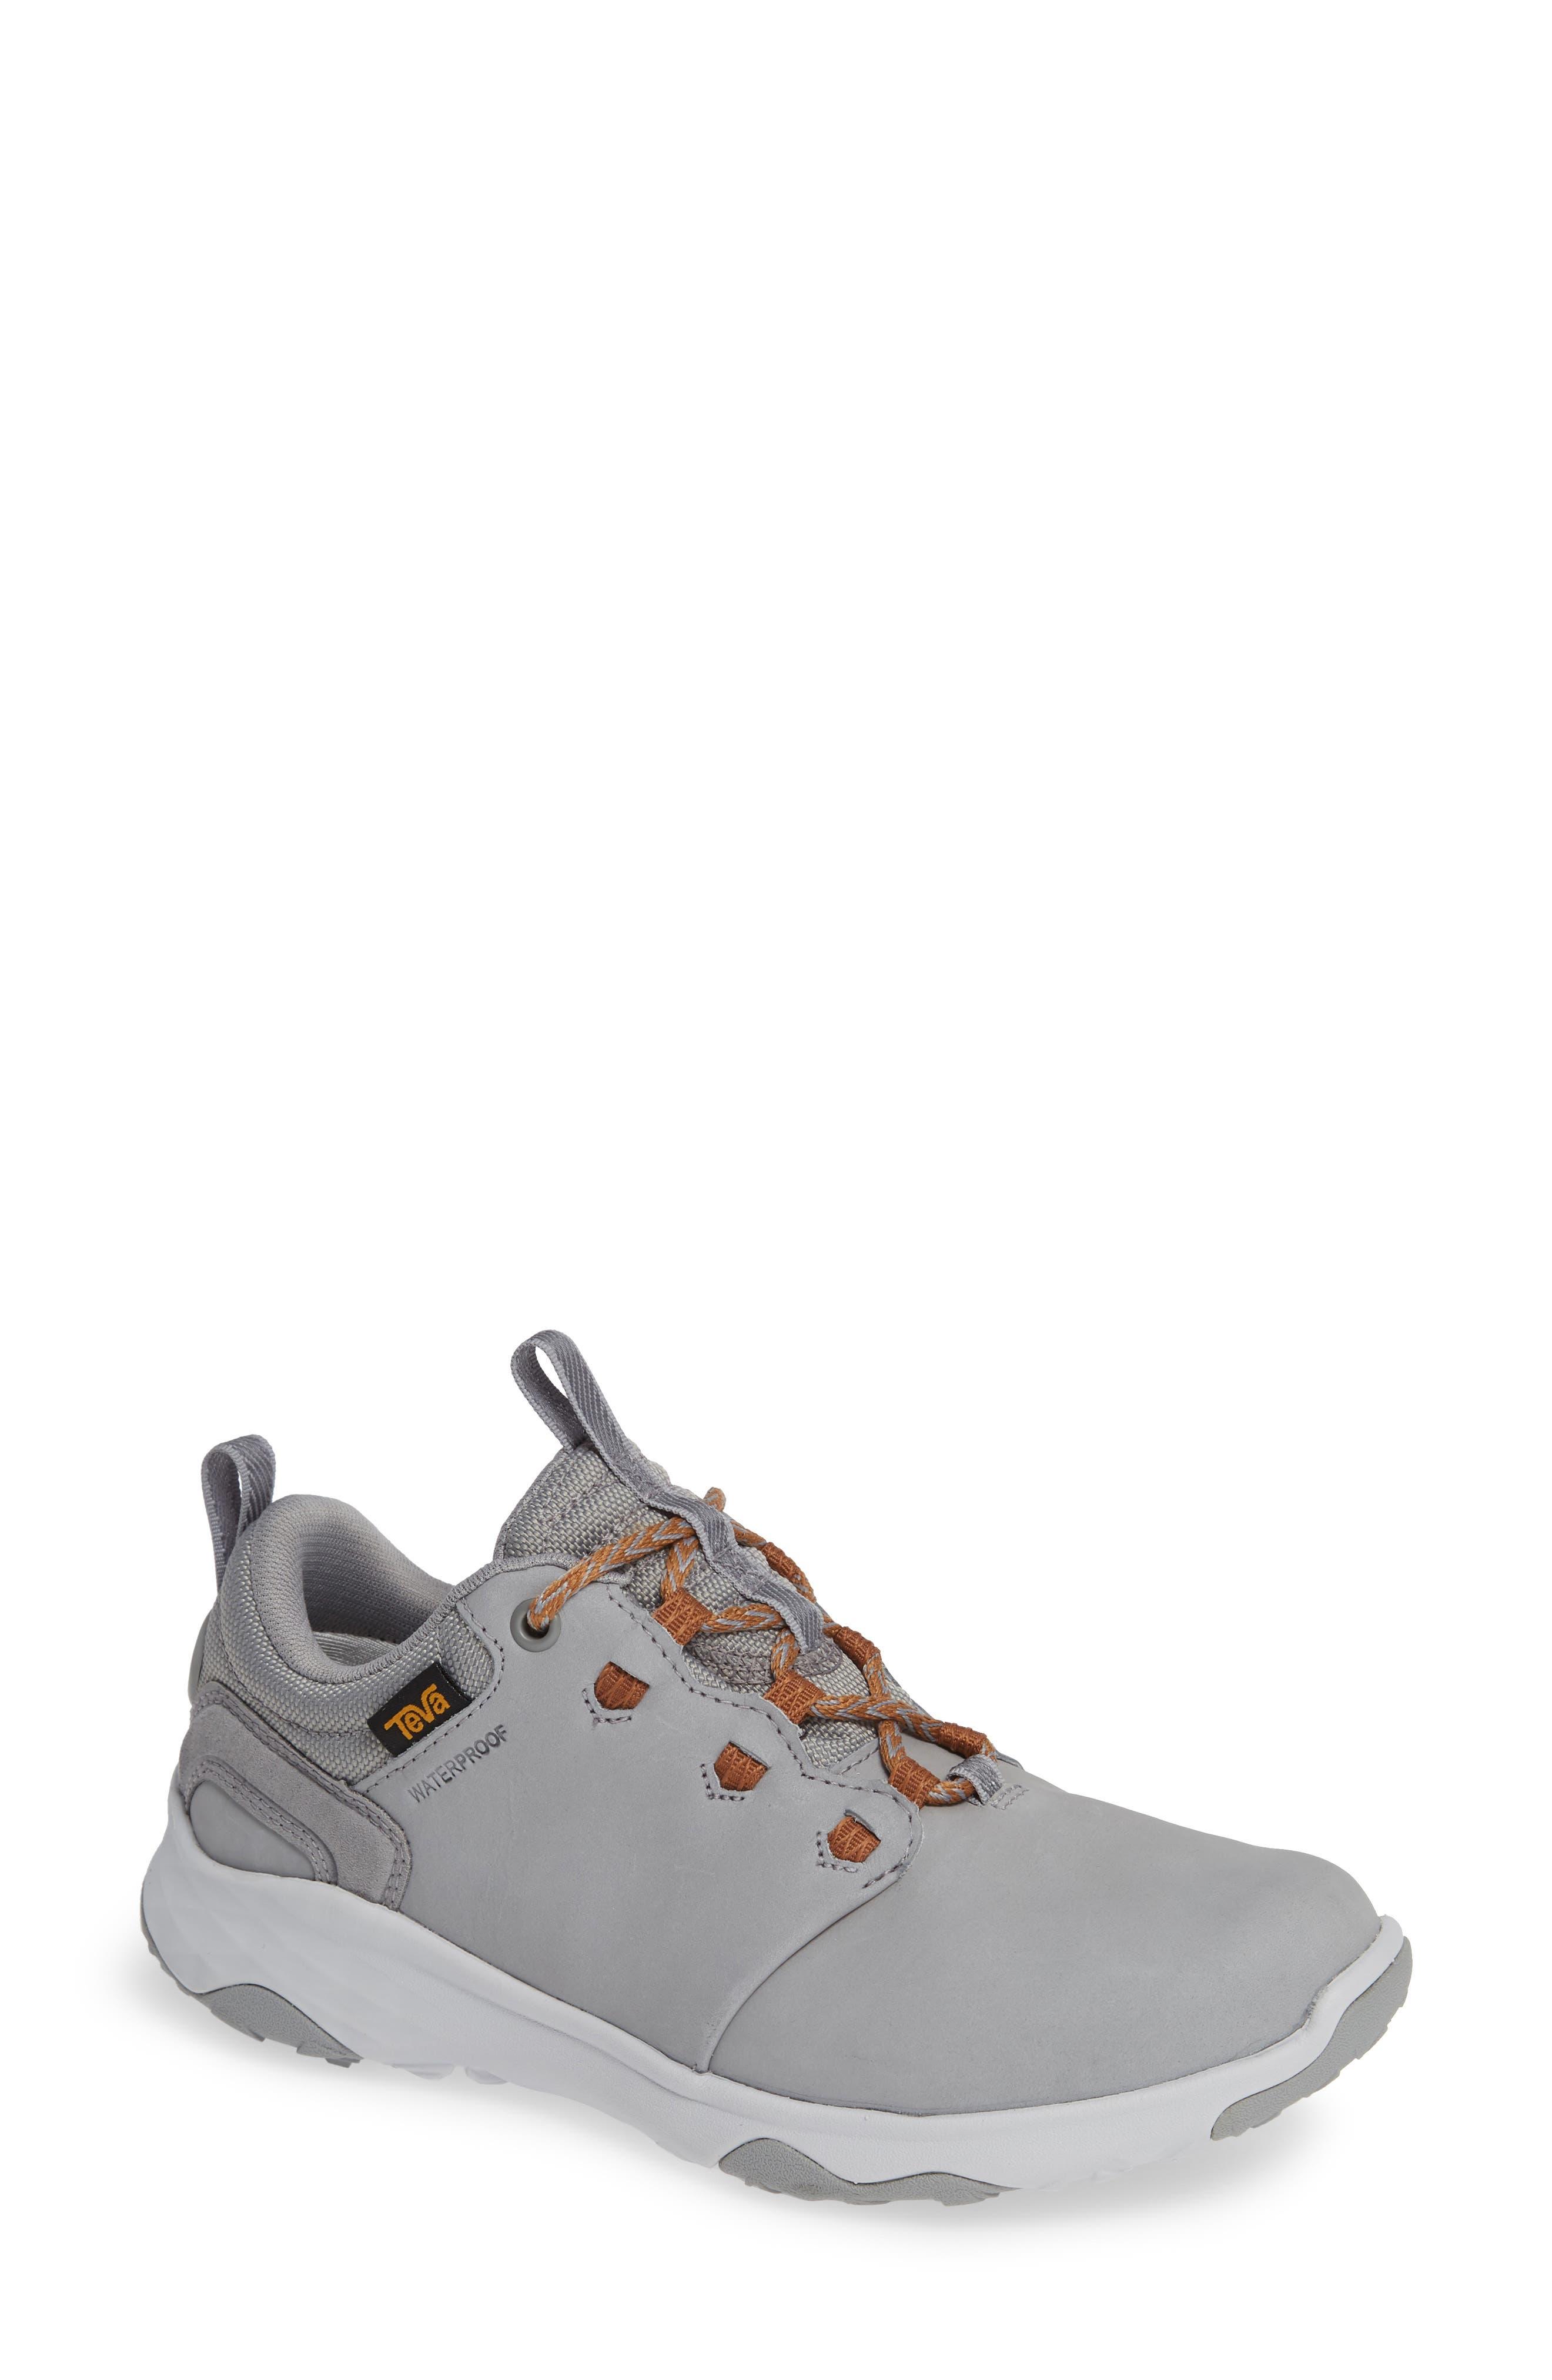 TEVA 'Arrowood' Waterproof Sneaker in Wild Dove Leather